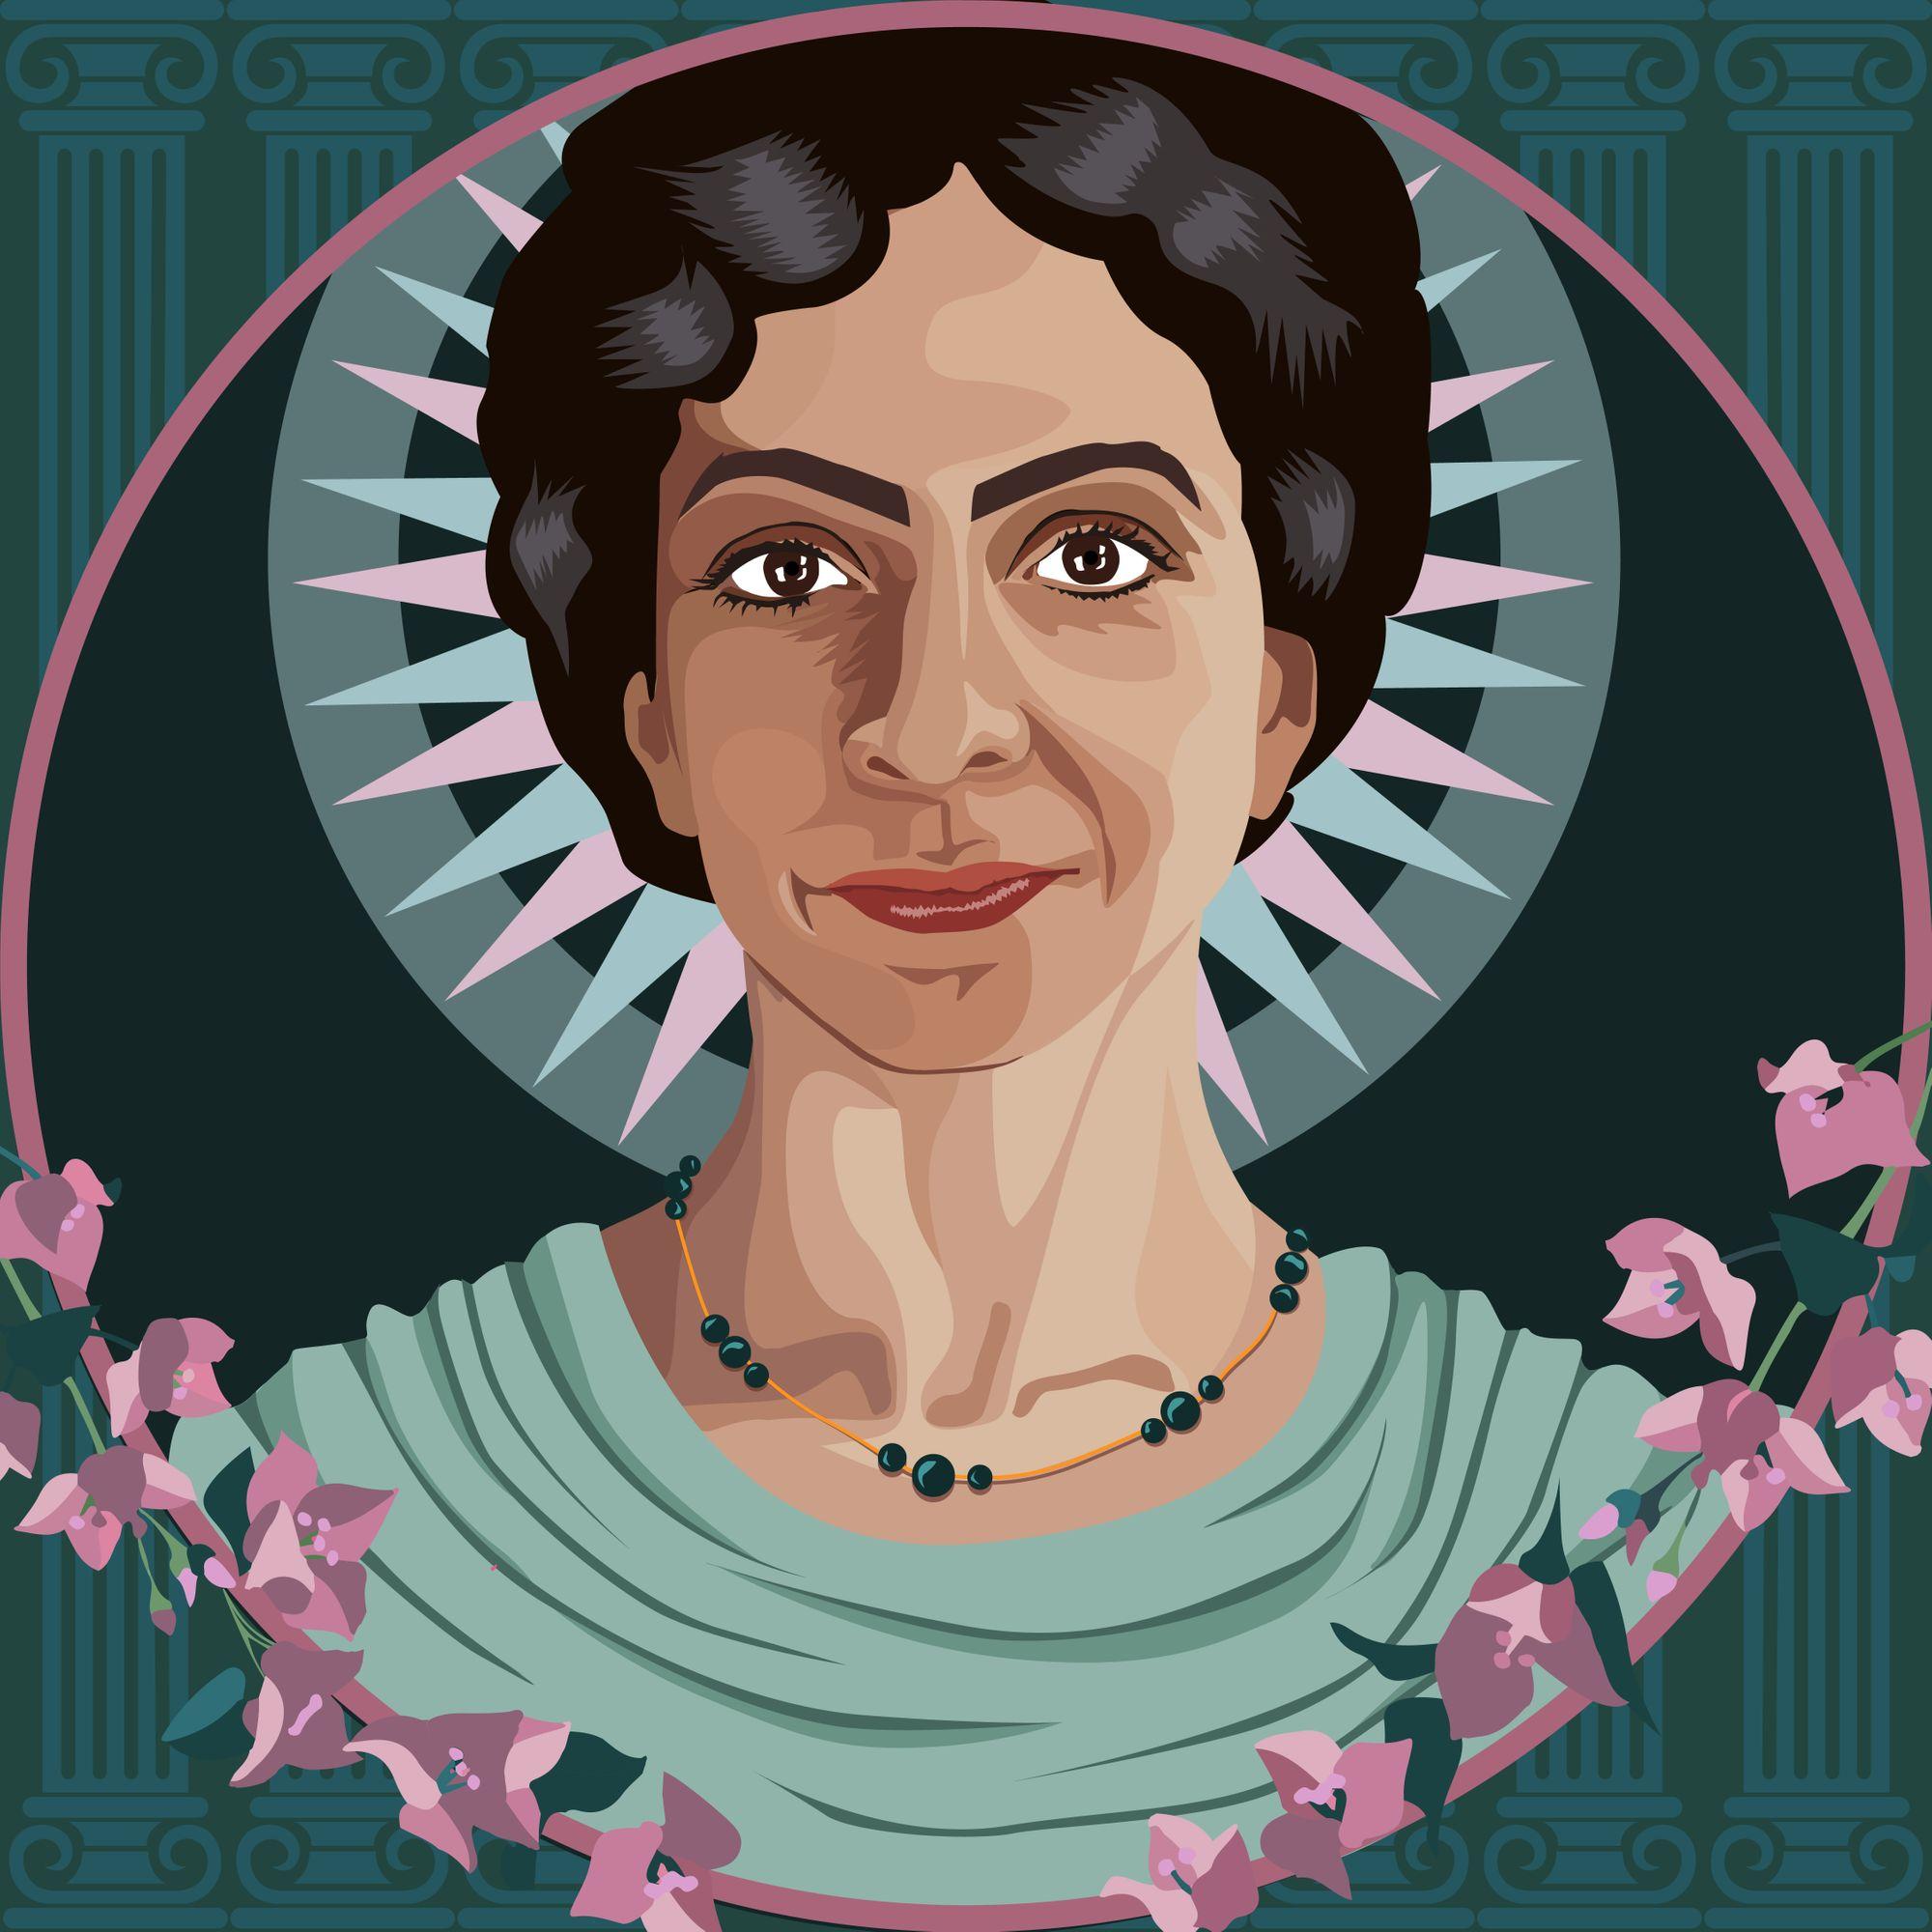 Priscilla: Mother of Teachers